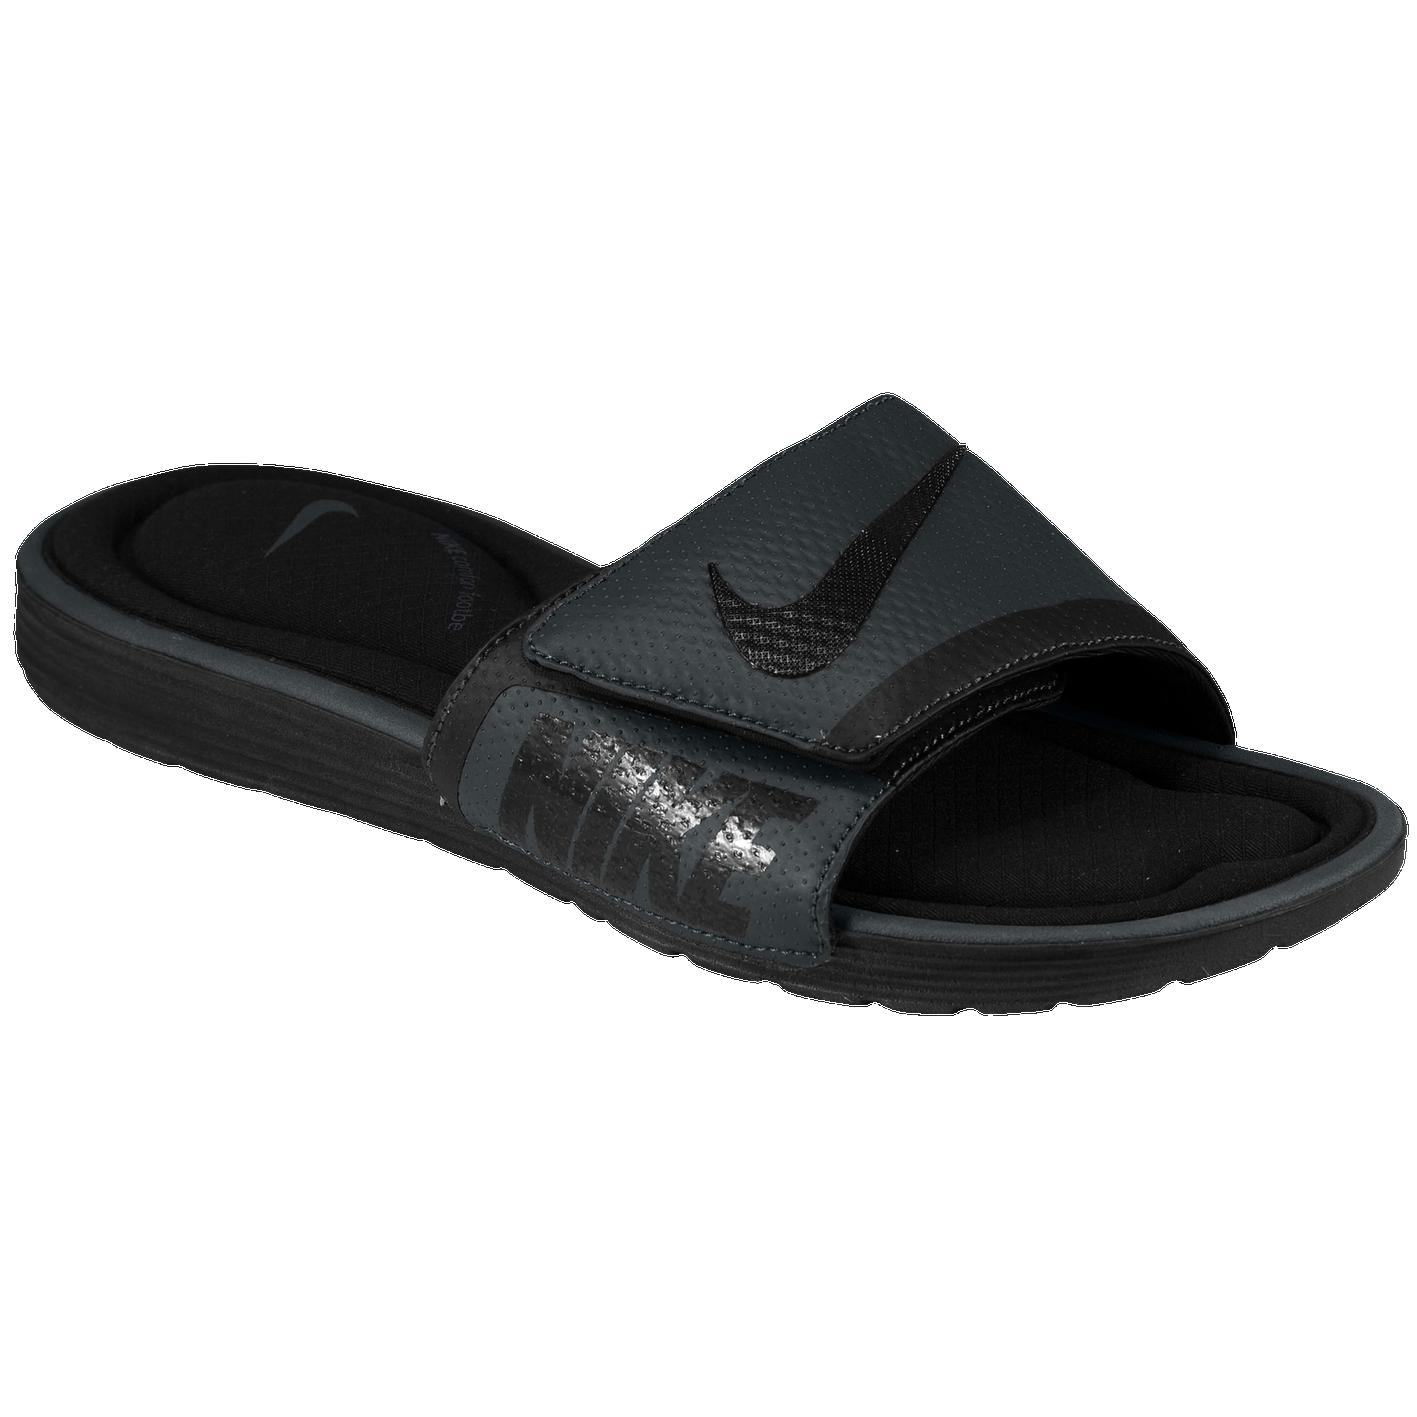 f1b3cf230 Nike Solarsoft Comfort Slide - Men s - Casual - Shoes - Black Anthracite